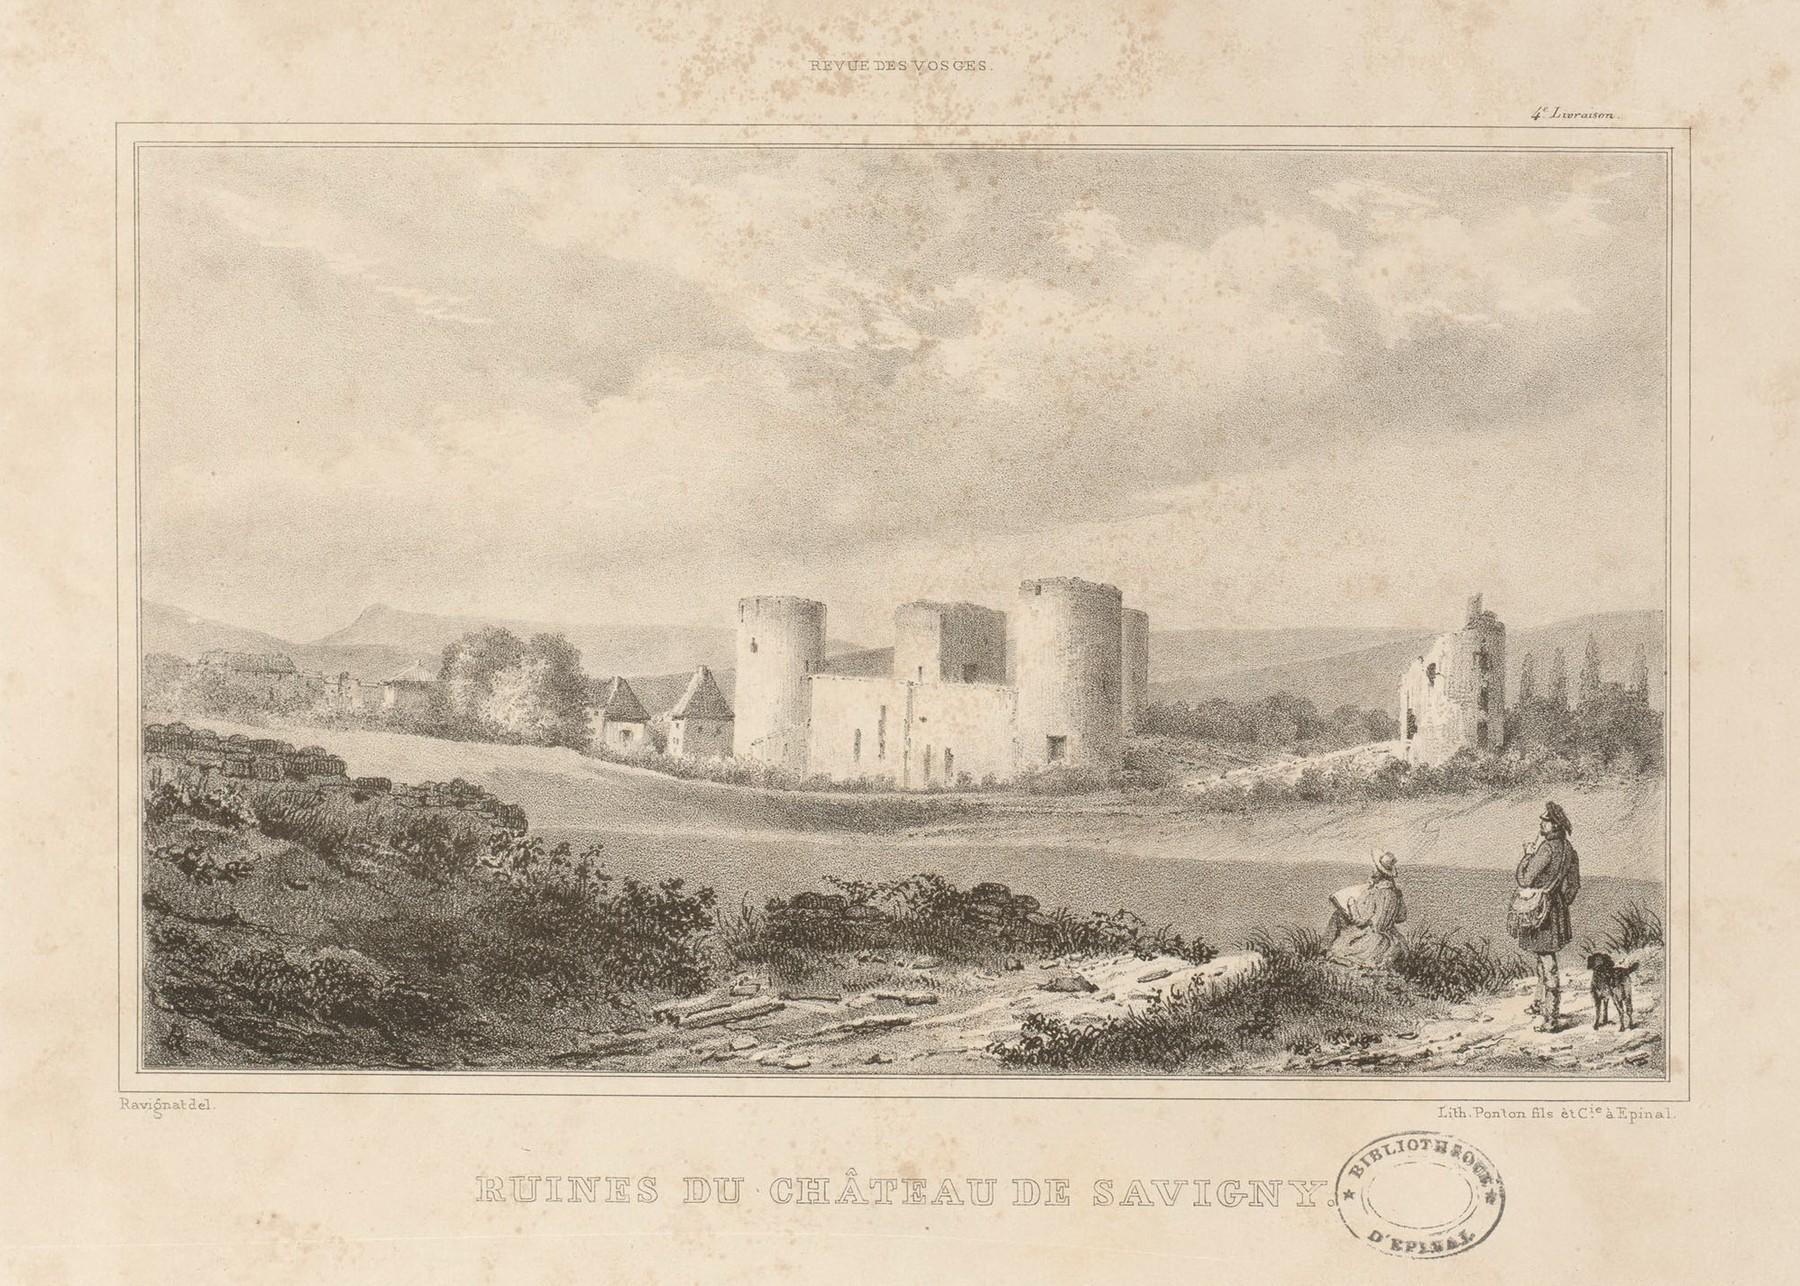 Contenu du Ruines du château de Savigny